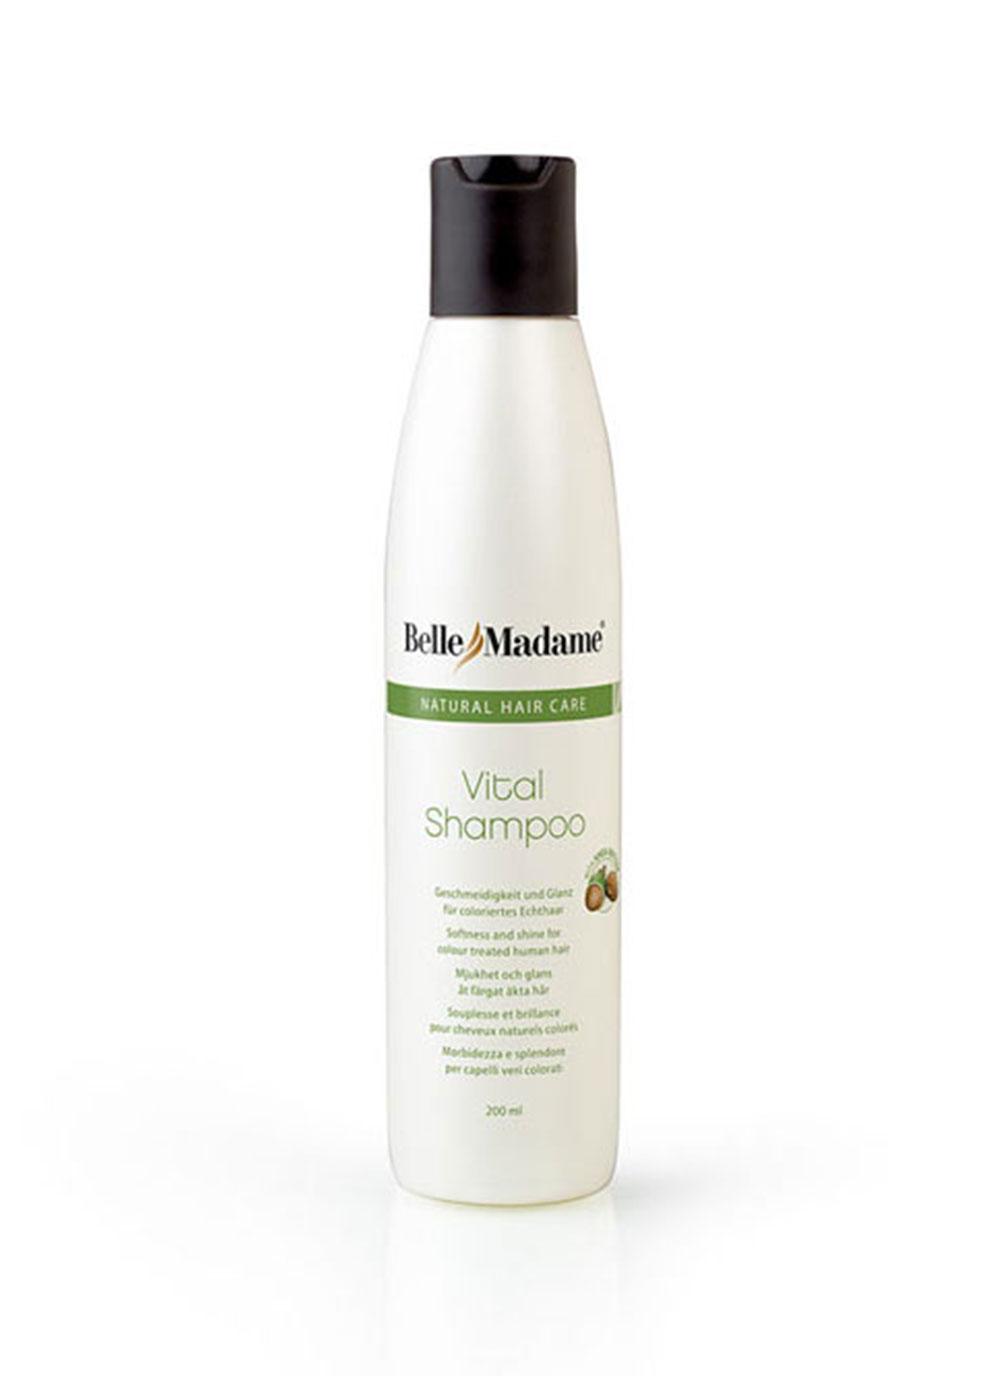 Dening Hair Zubehör - Vital Shampoo Echthaar 200ml